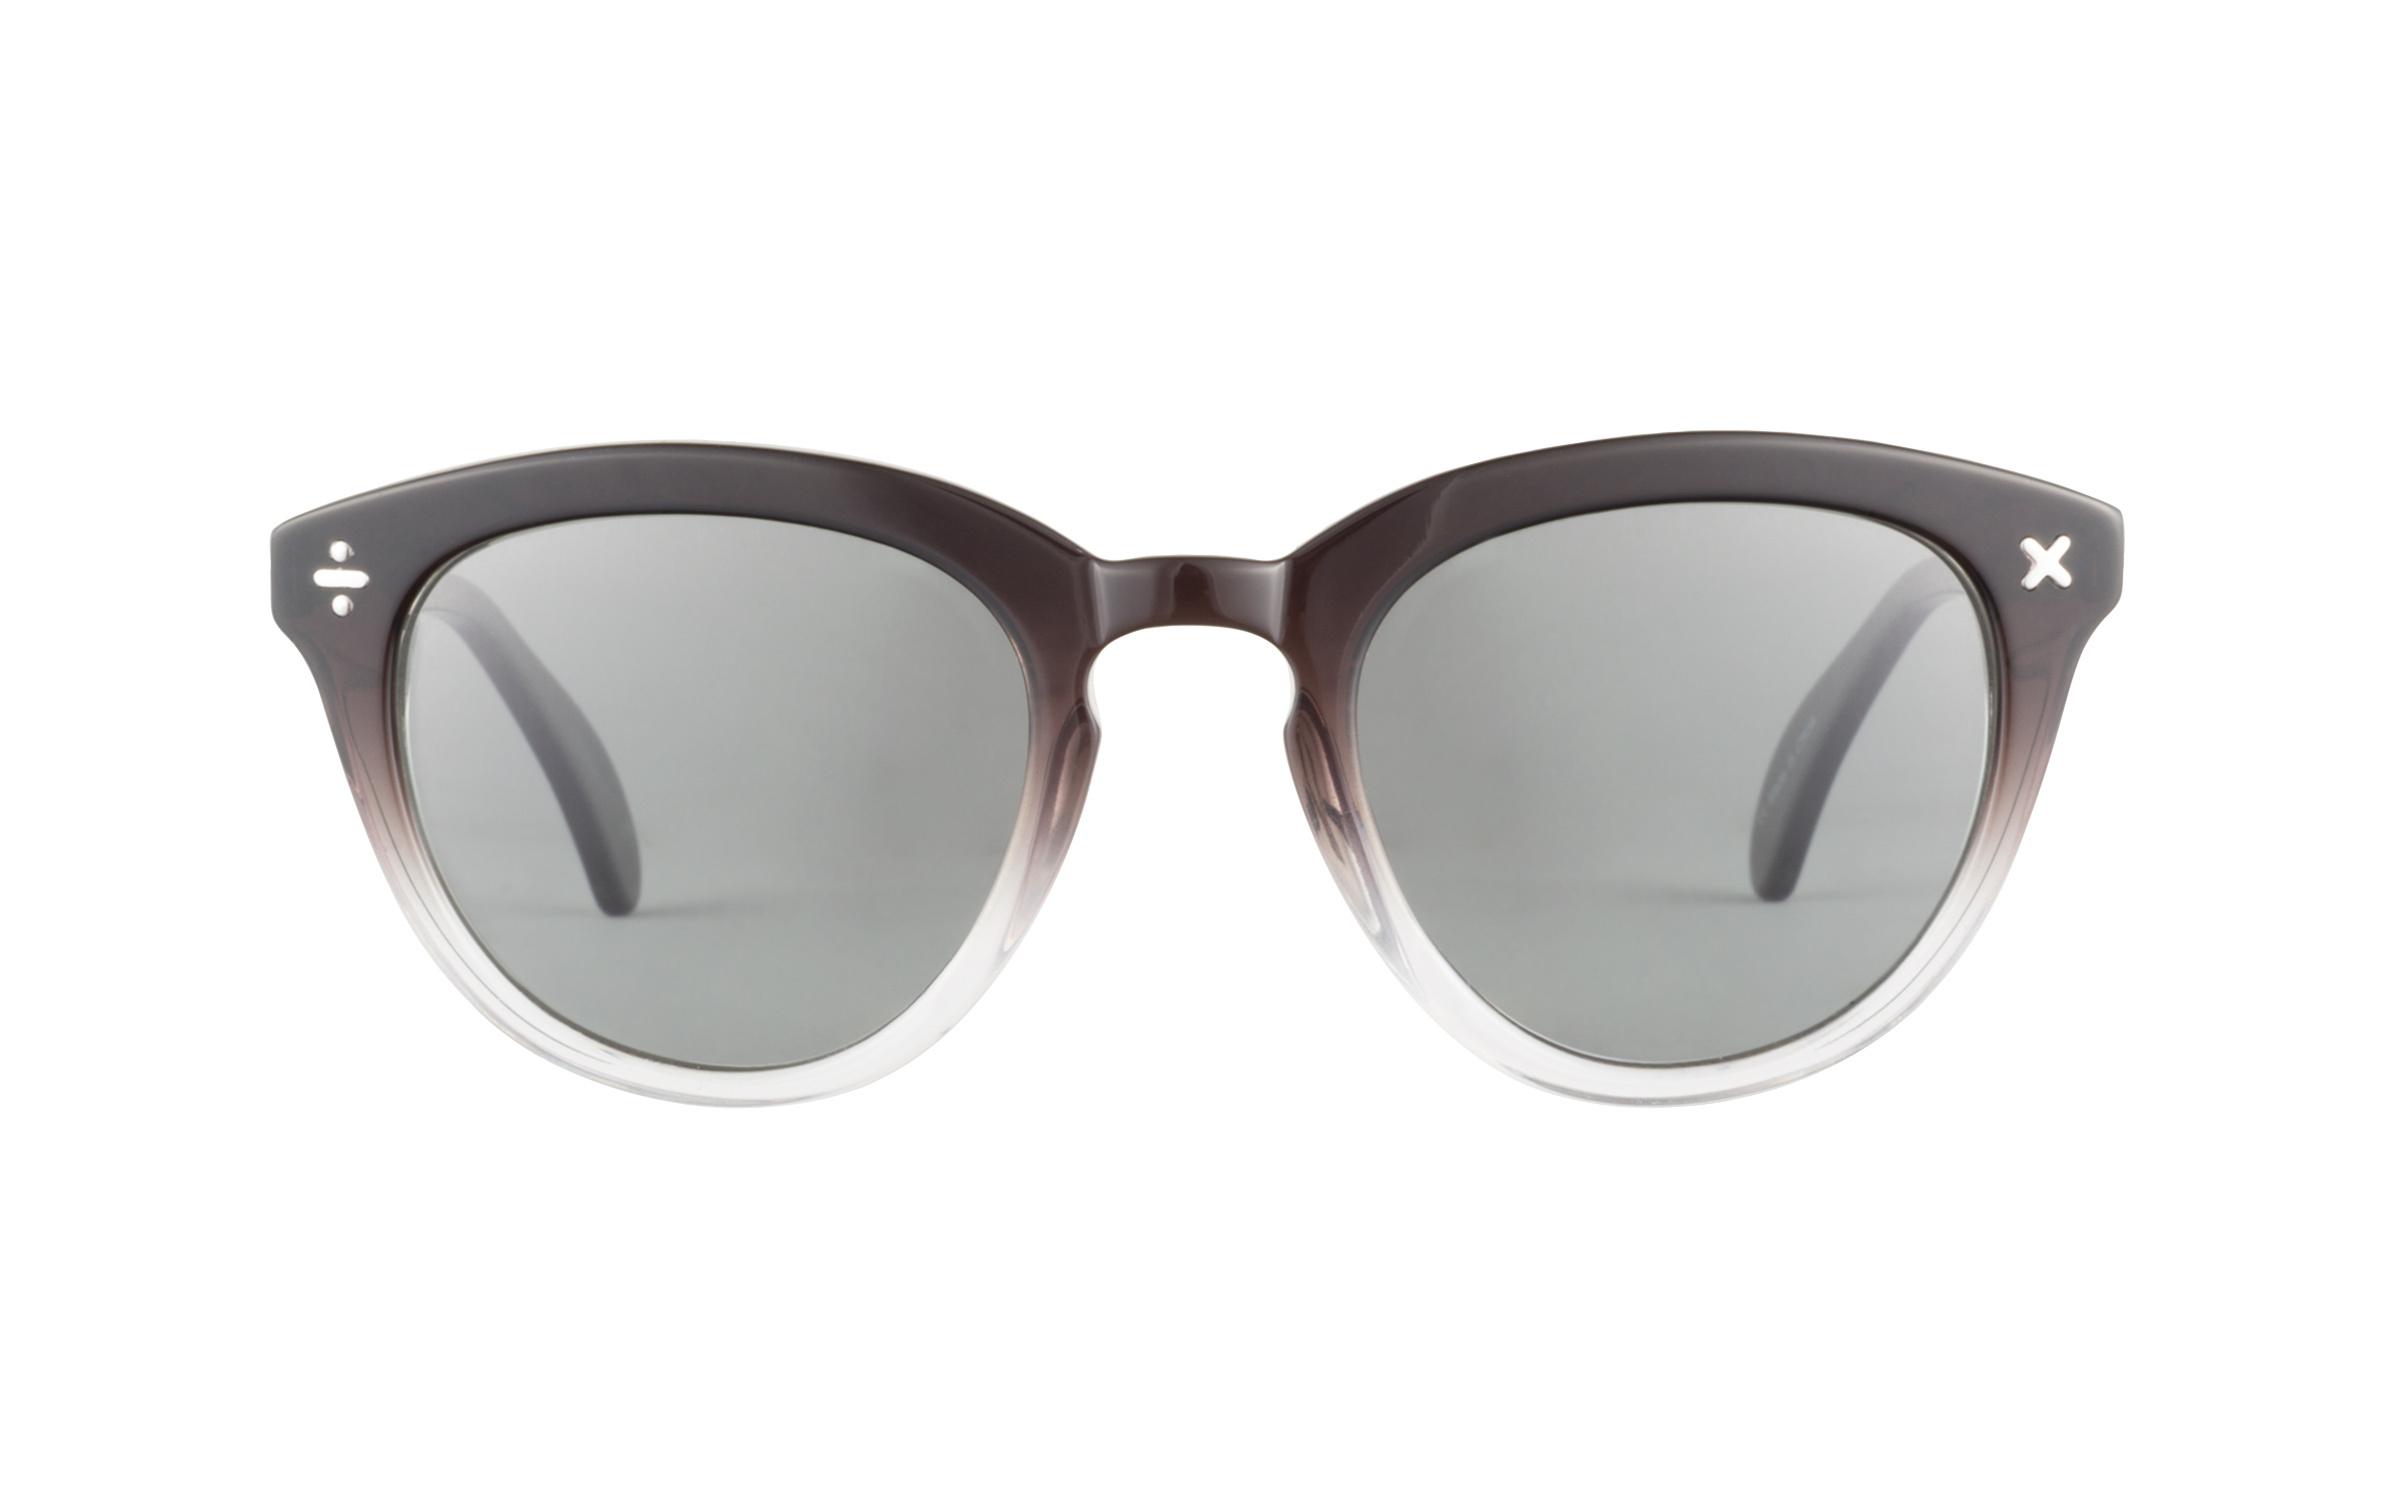 Vintage Sunglasses Black Derek Cardigan Online Coastal